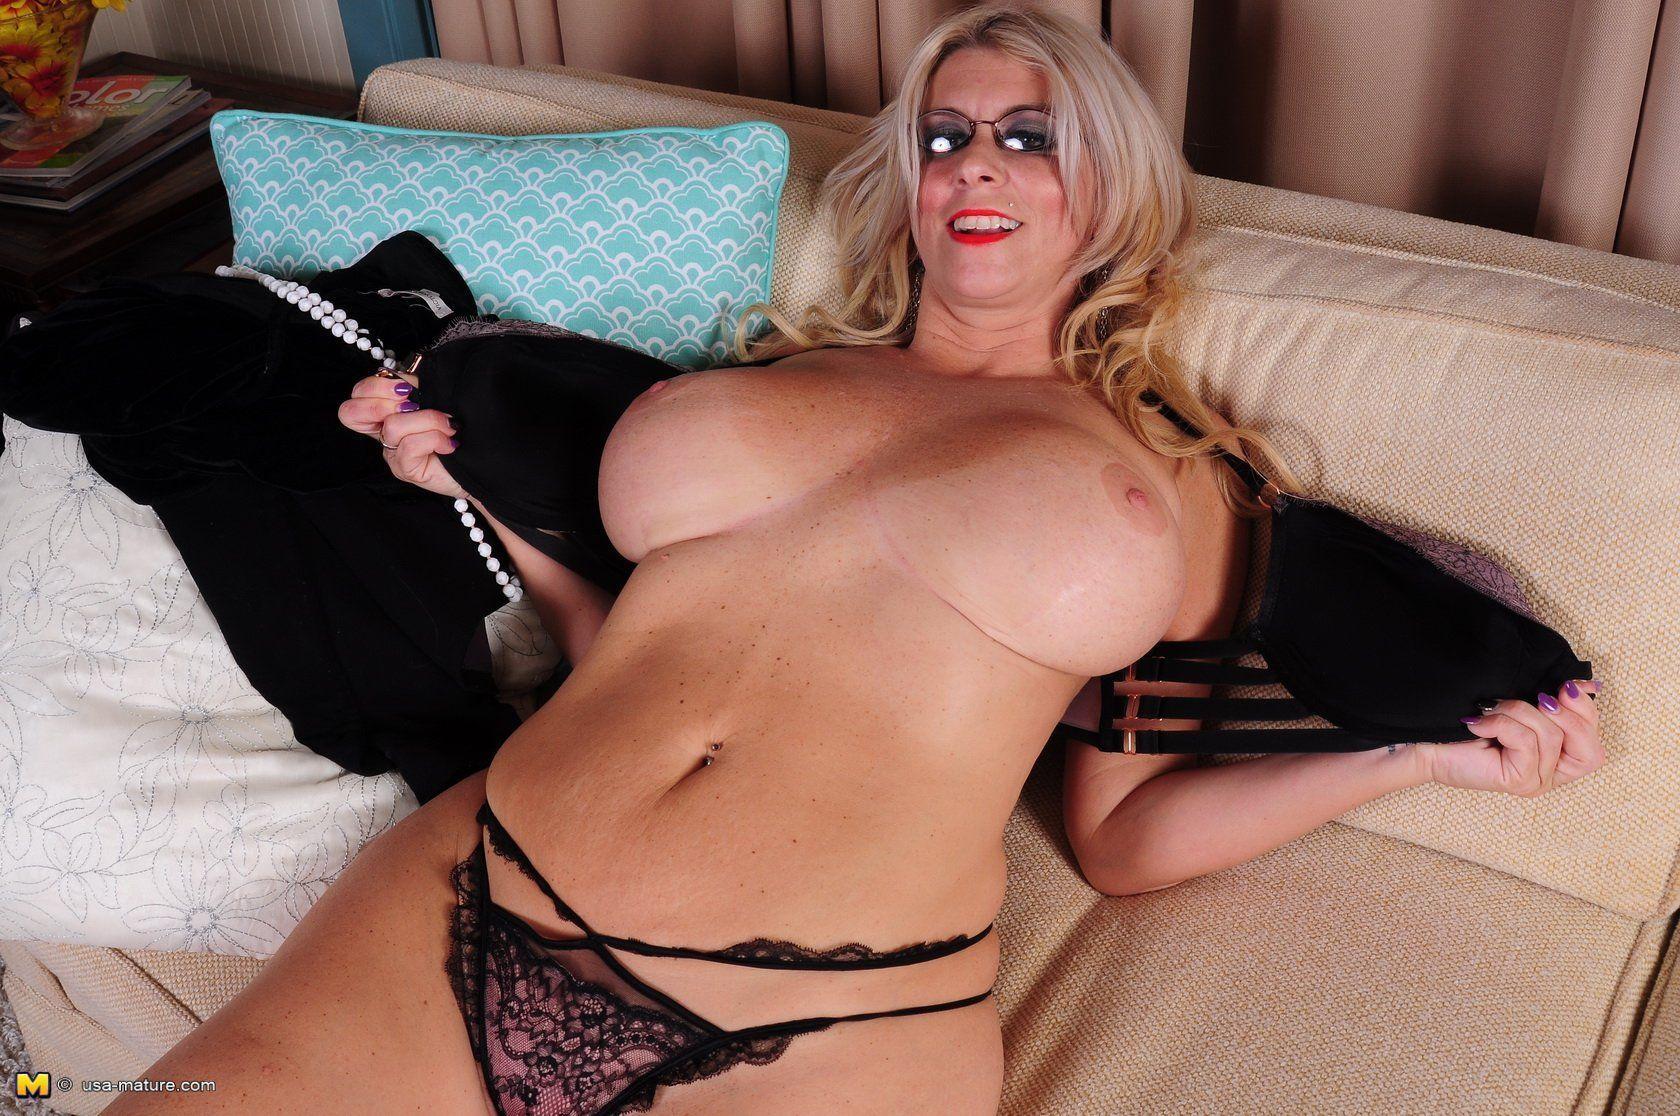 American Milf Nude galleries milf mature - hot pics